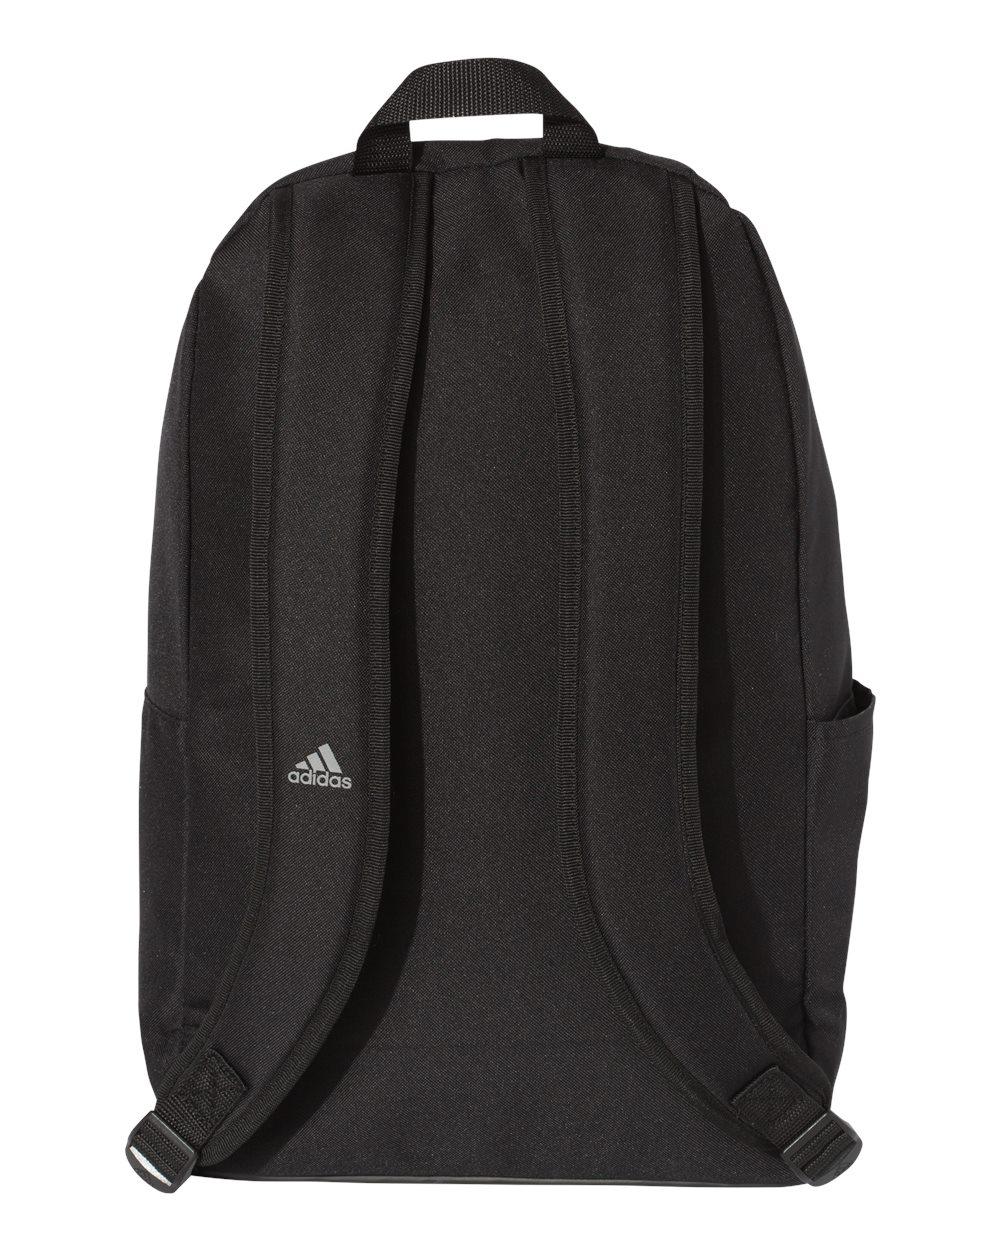 Adidas-Laptop-School-bookbag-18L-3-Stripes-Small-Backpack-11x18x5-5-A301 thumbnail 7